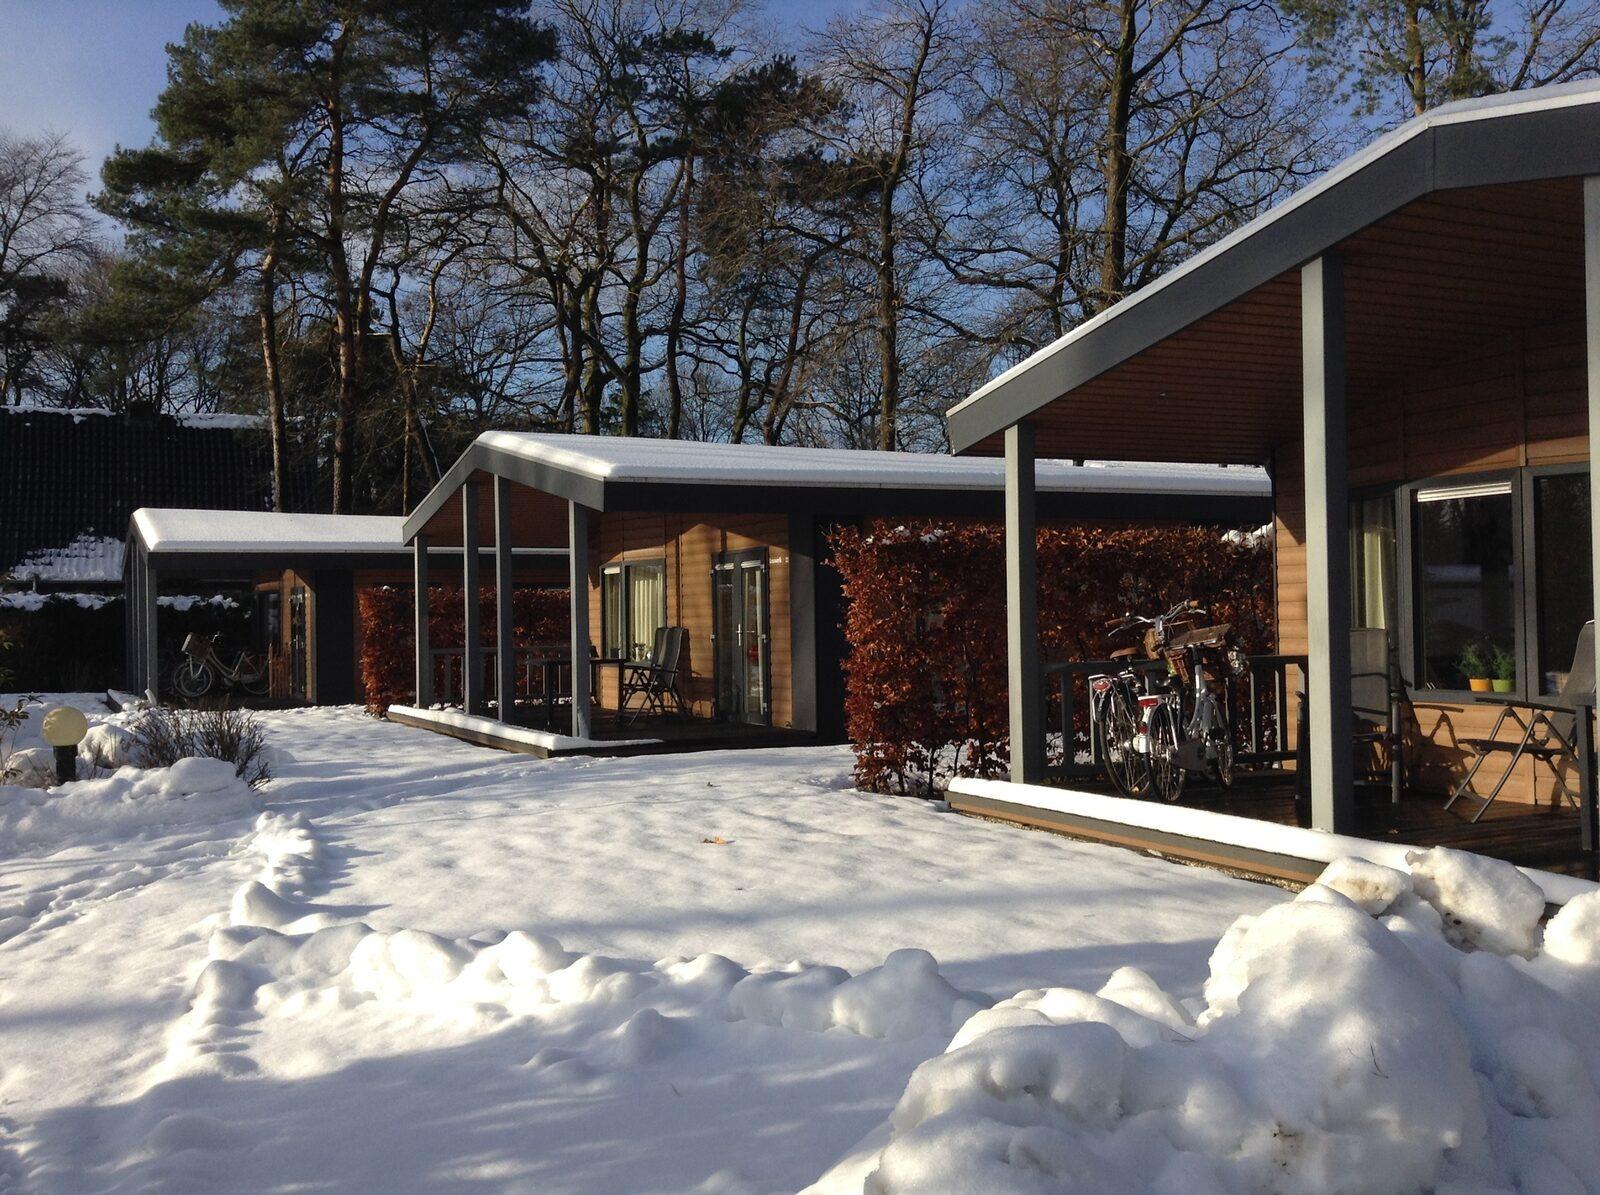 Veranda bungalowchalet | 6 pers.